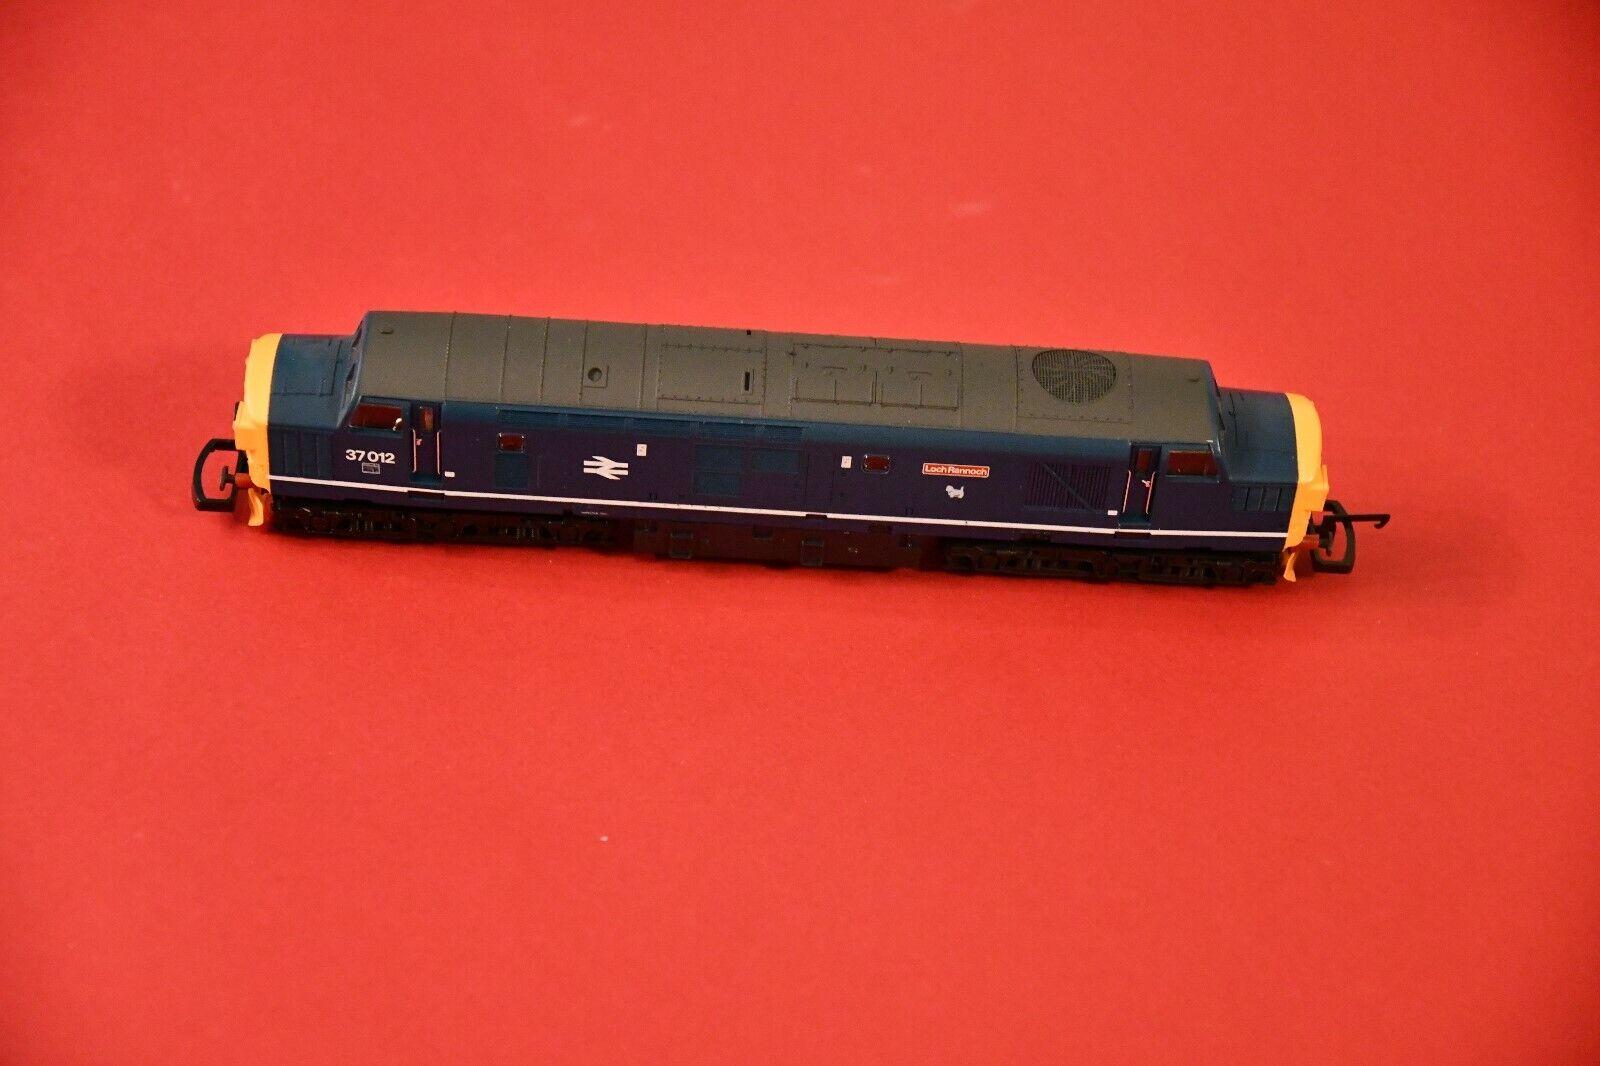 Lima Lok H0 - No 115 - L205172 Class 37 diesel BR azul 37012  Loch Rannoch